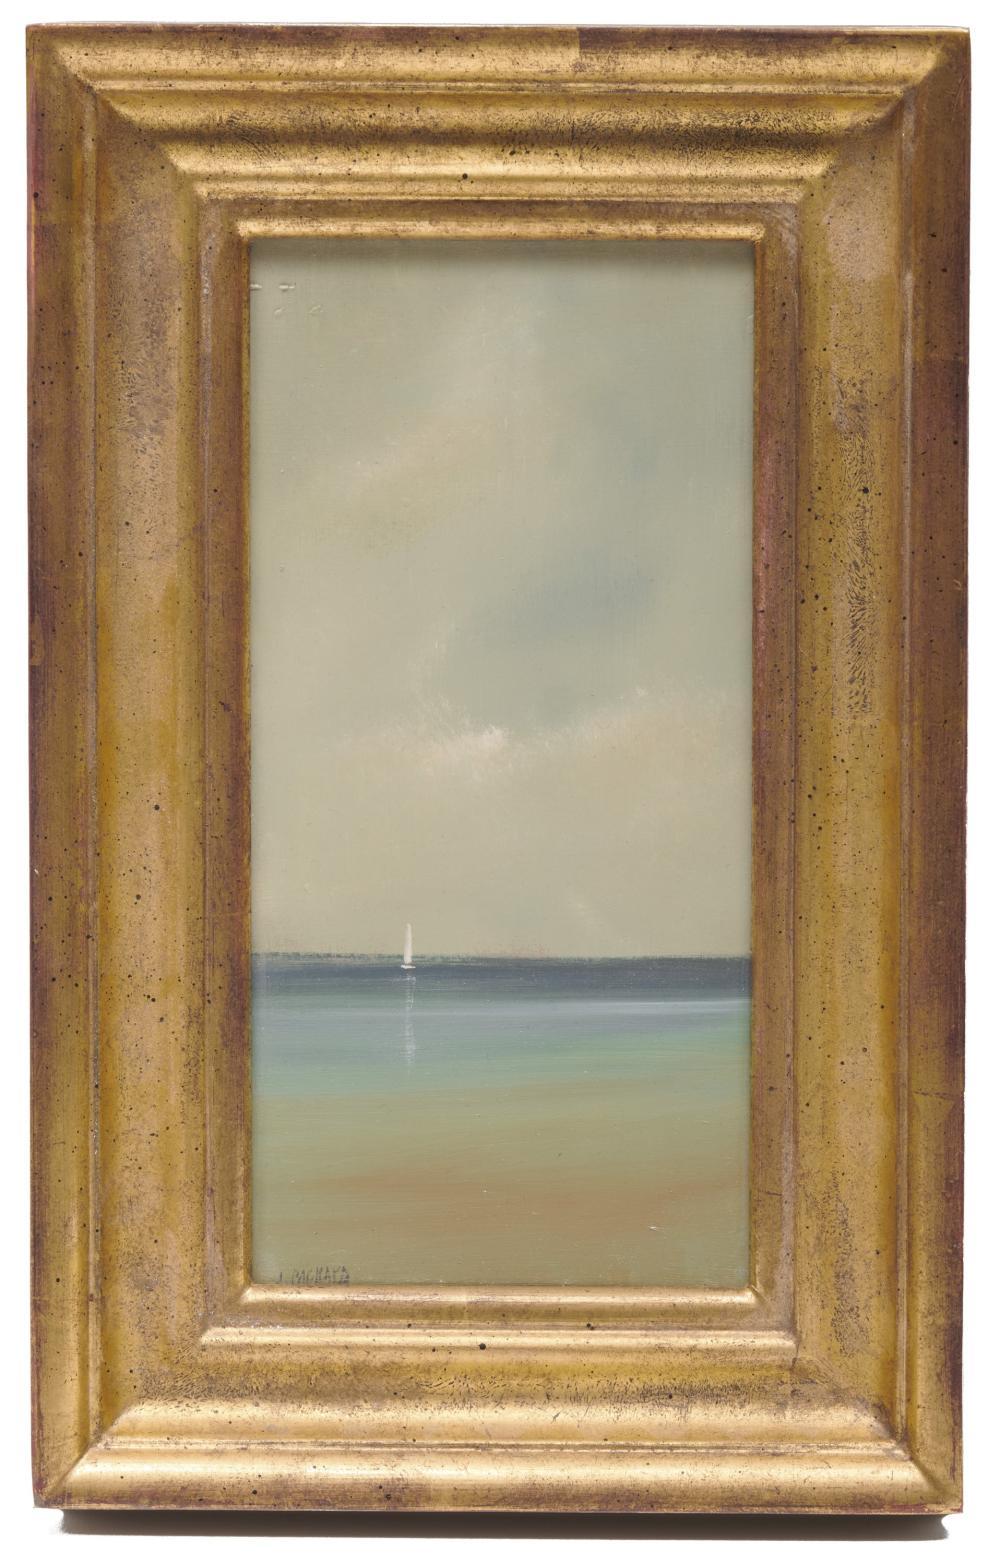 ANNE PACKARD, (American, b. 1933), Lone Sail Boat, oil on board, 10 x 5 in., frame: 13 1/2 x 8 1/2 in.